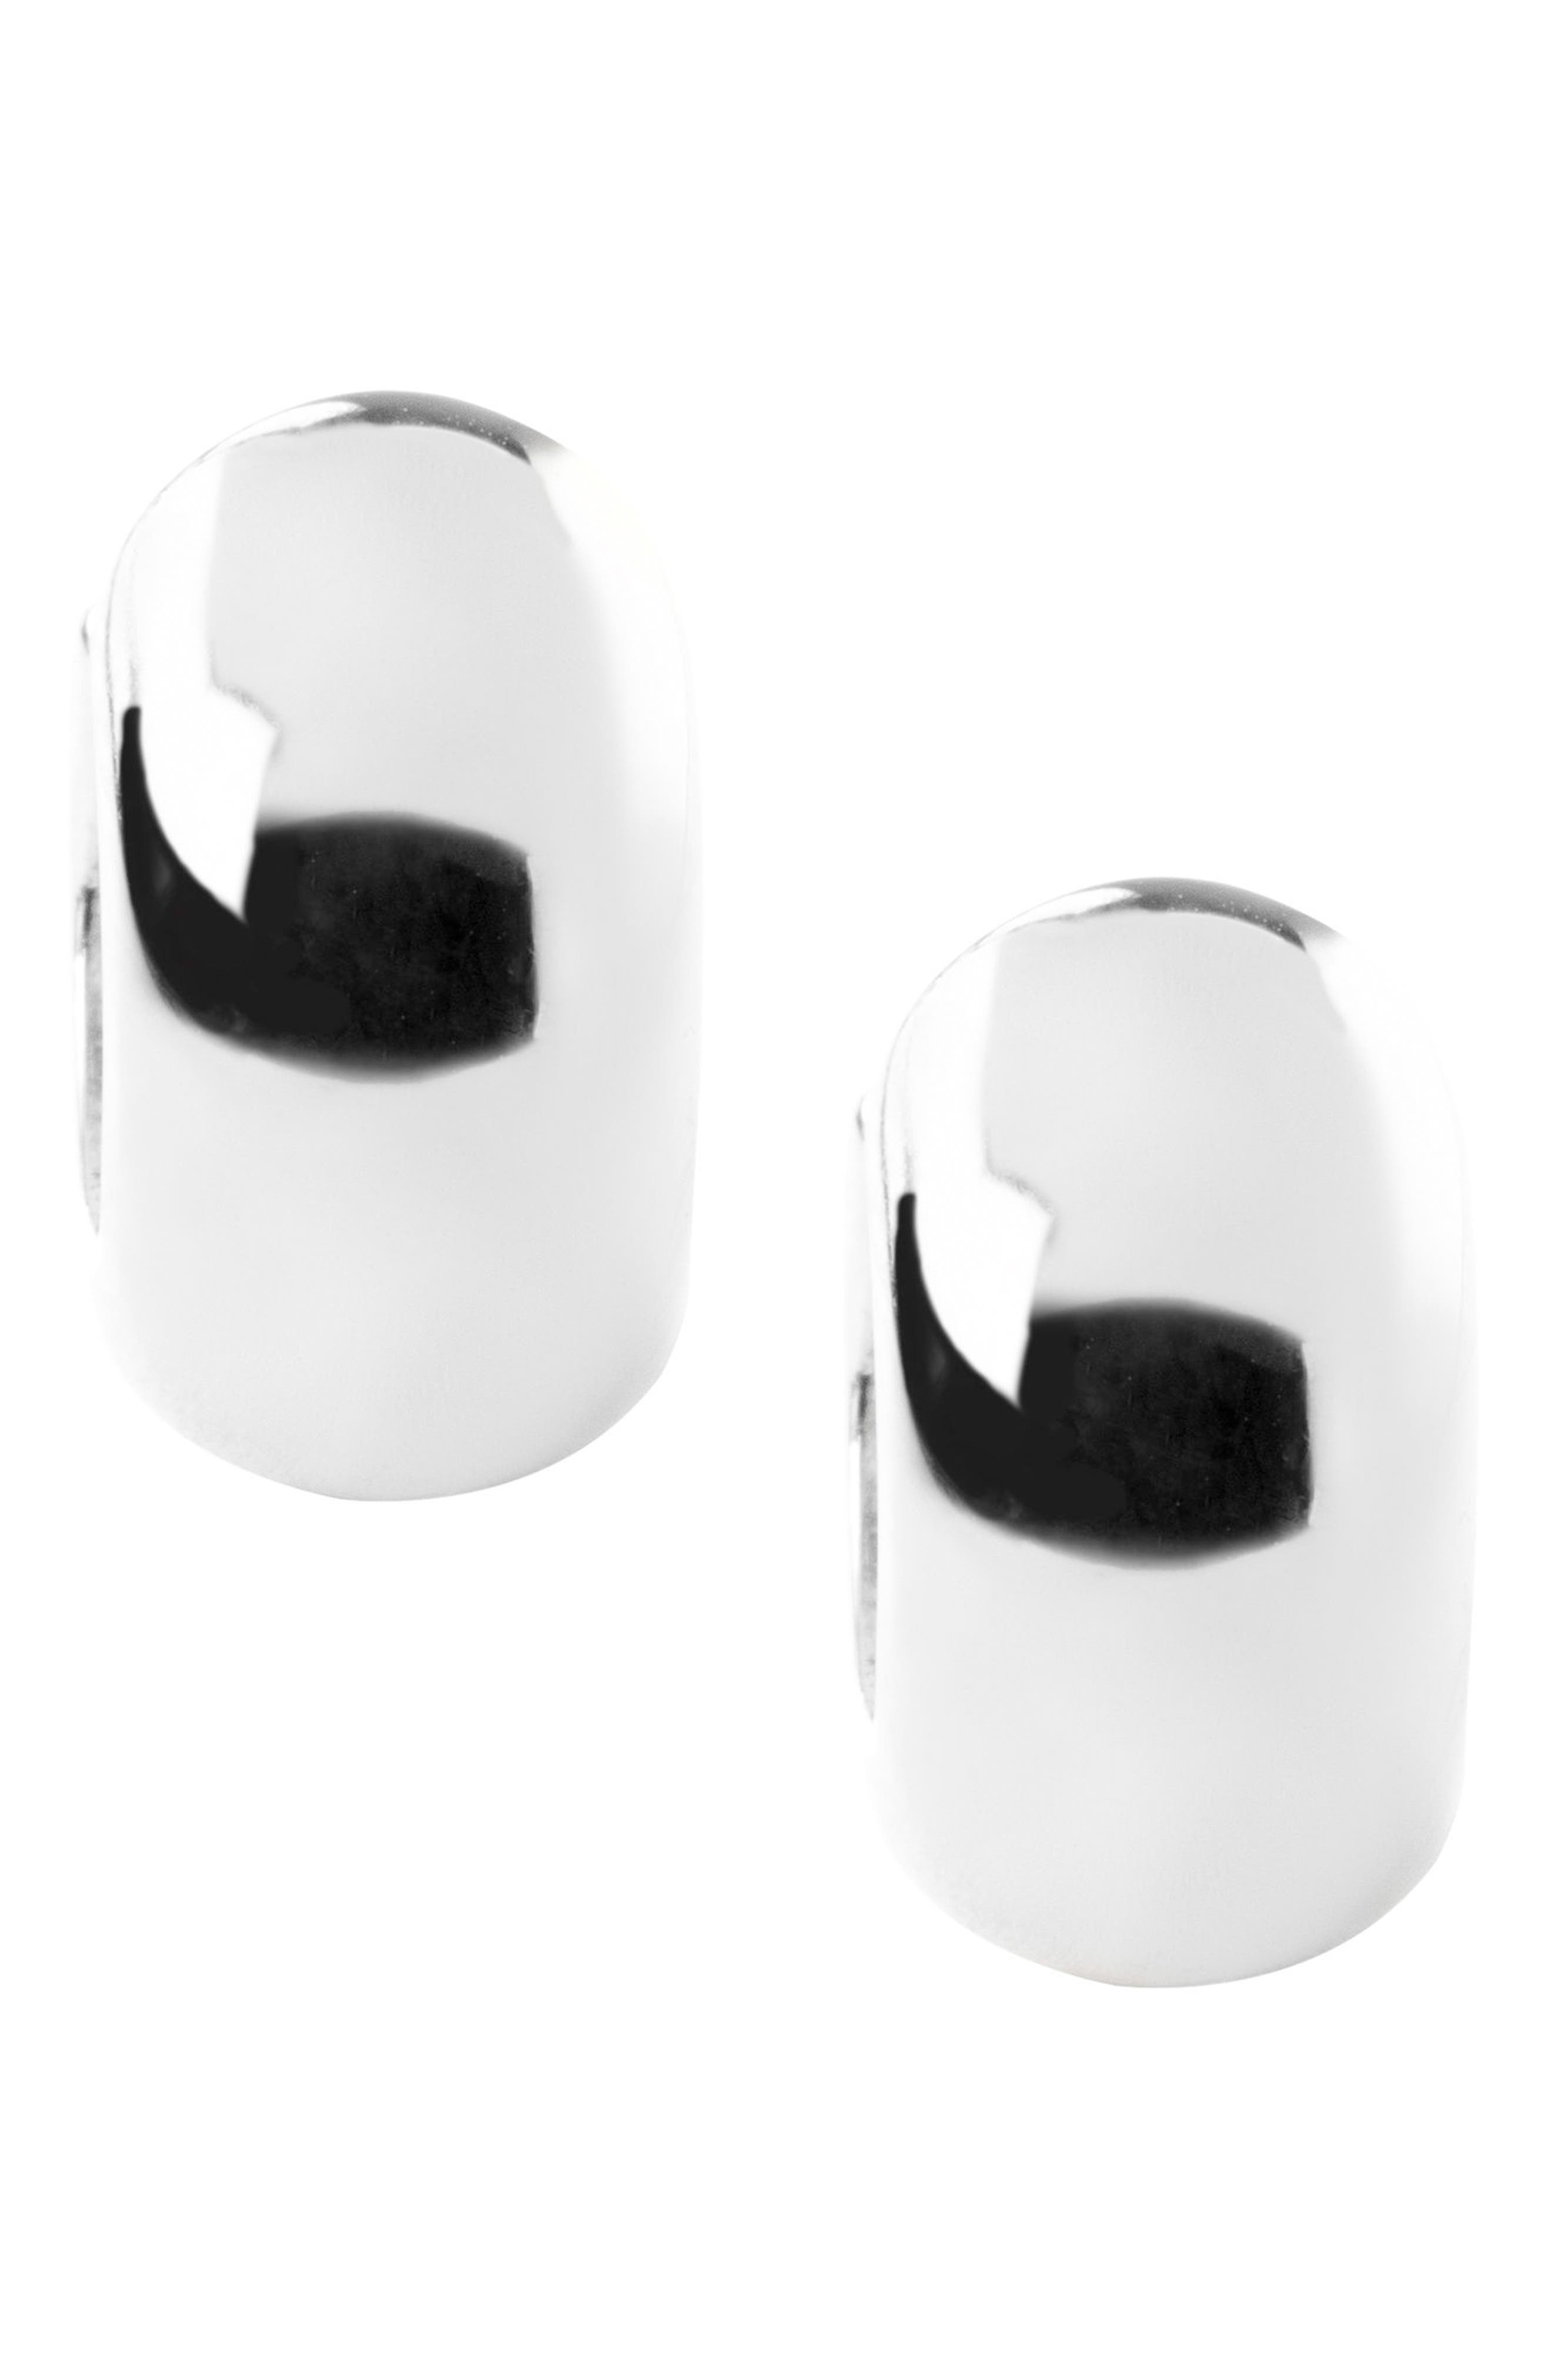 ERWIN PEARL,                             Stripe Black Segmented Hug Earrings,                             Alternate thumbnail 3, color,                             BLACK